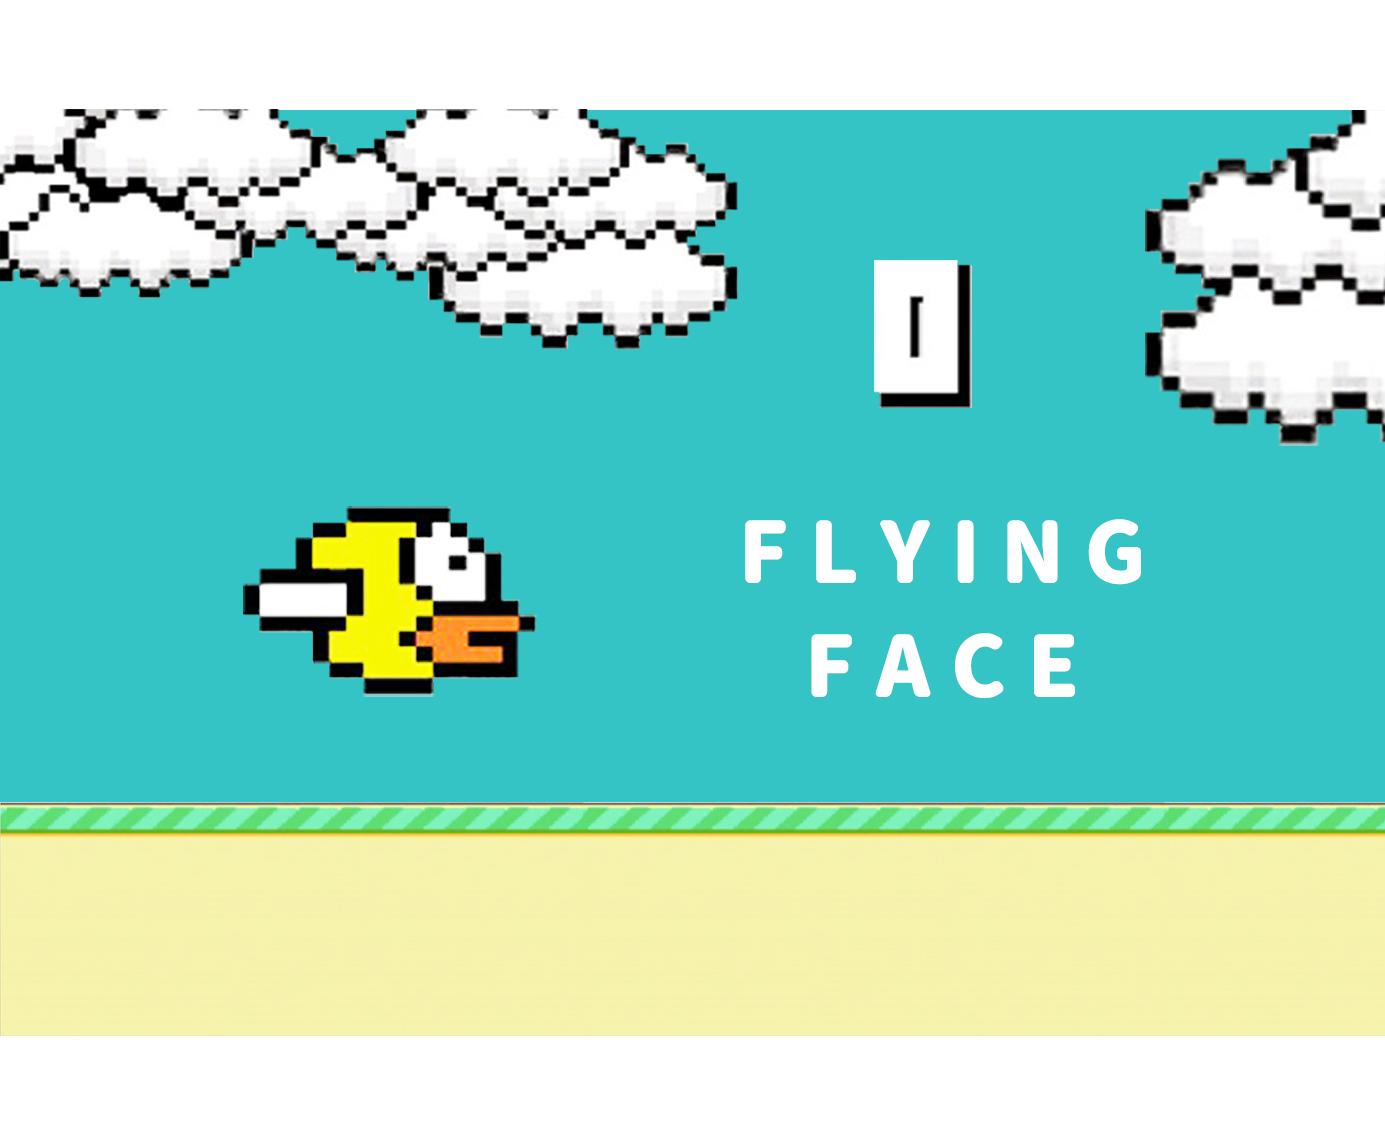 【Instagram限時動態】瞧瞧你是不是眼ㄆㄧㄚˇ,一玩就上癮的十款特效小遊戲